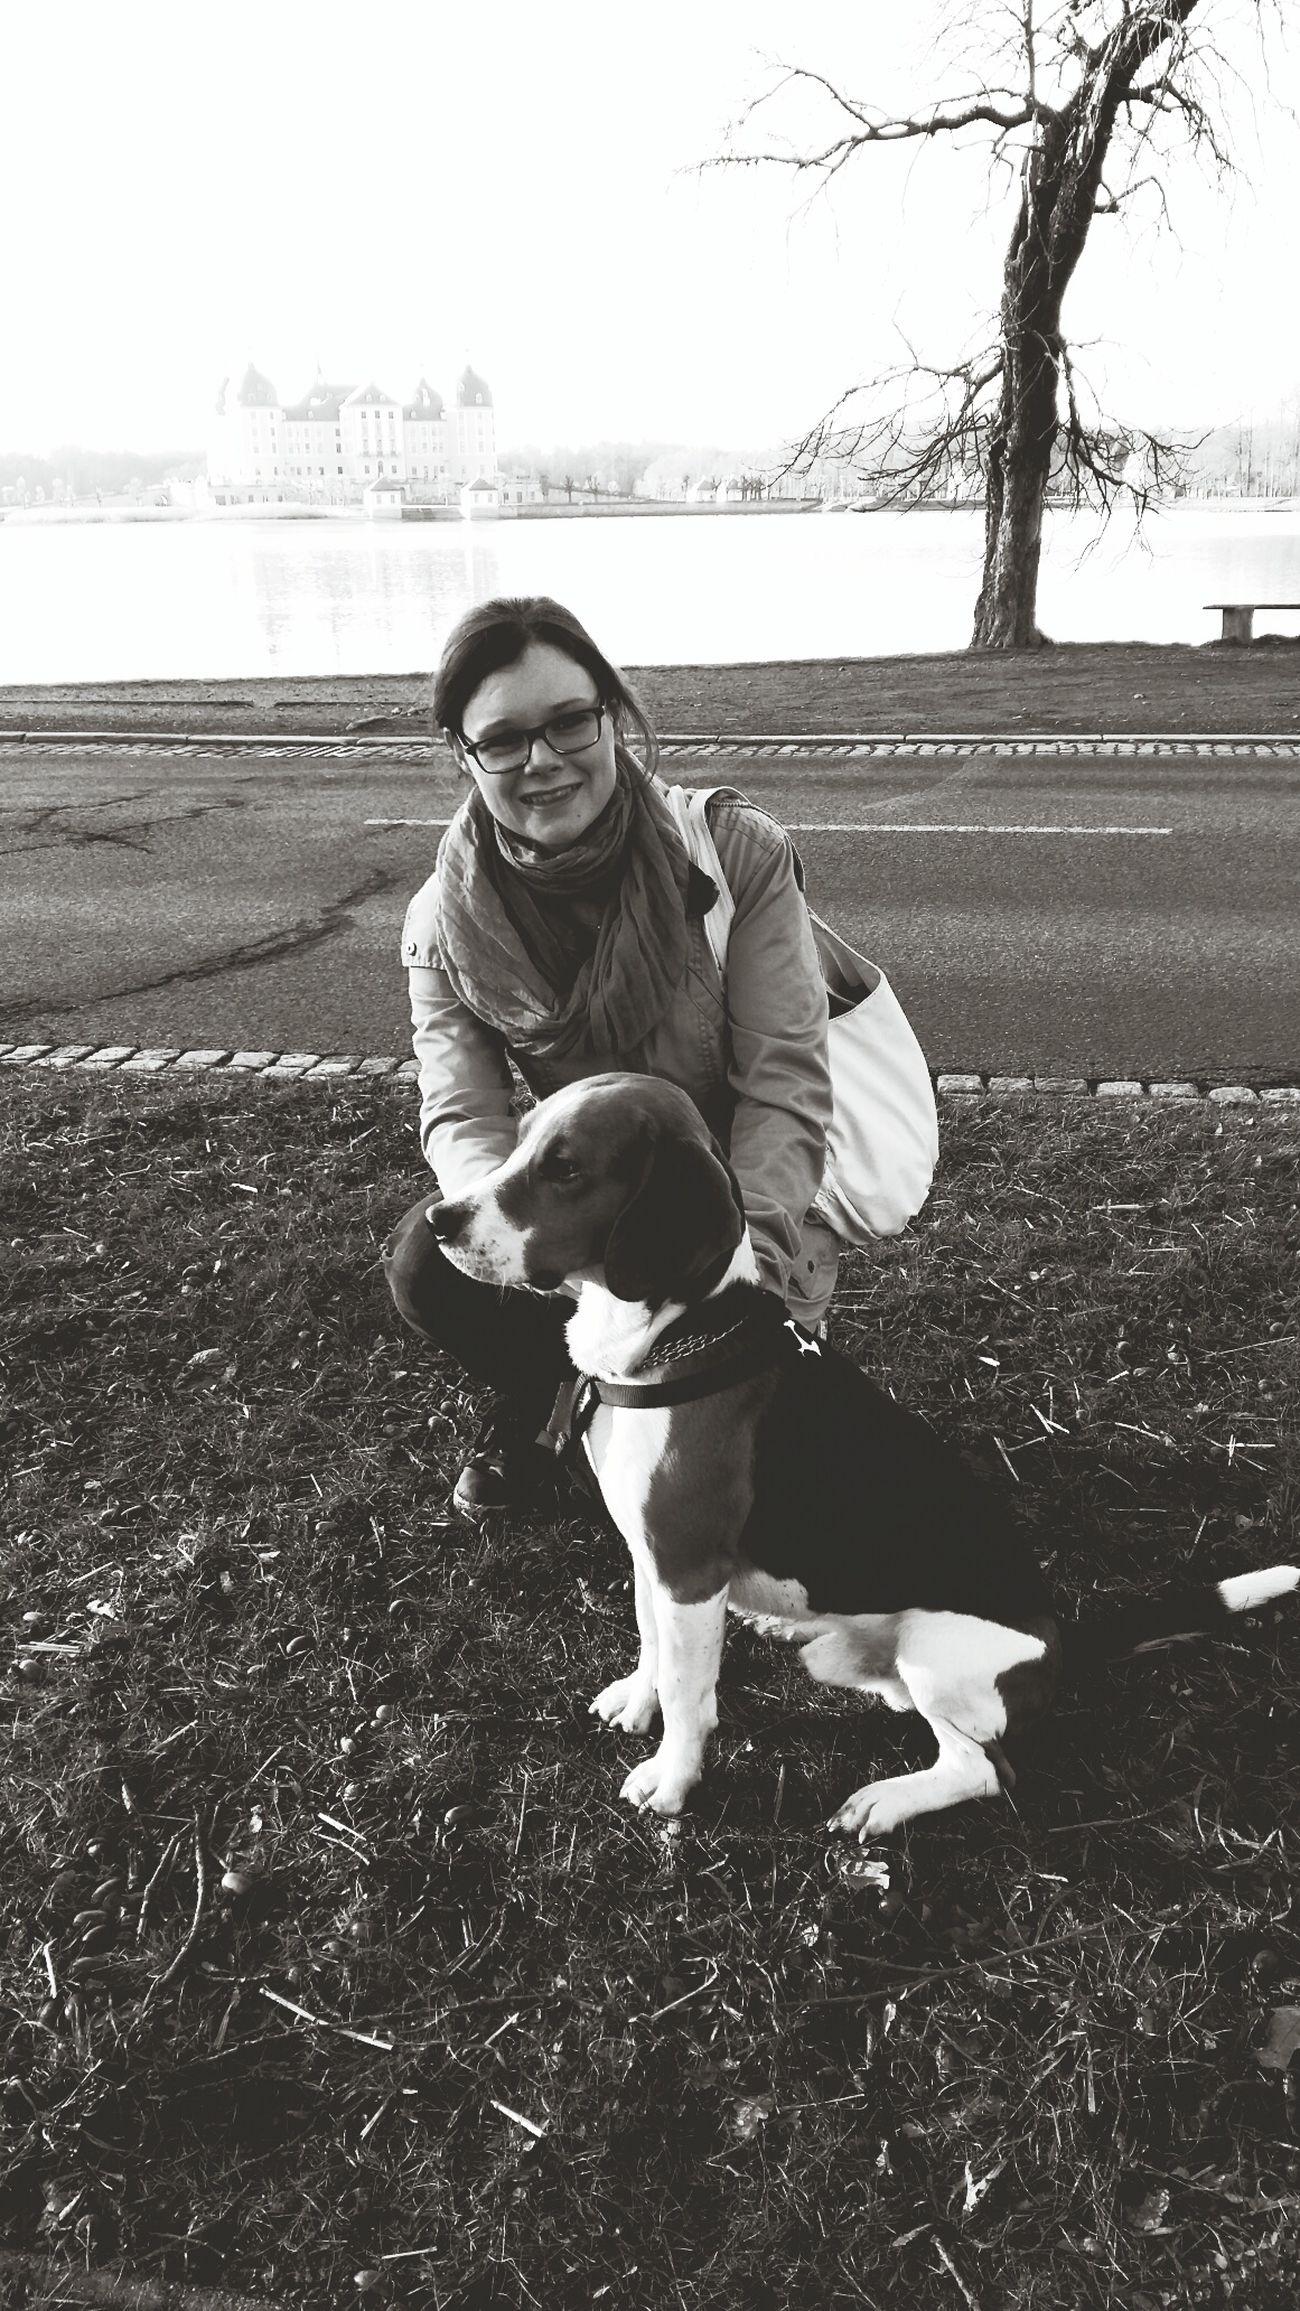 B&w Street Photography Sachsen Black And White Germany Dog Love Beaglelovers Beagle Moments Deutschland Deutschland. Dein Tag Beaglelove Beaglestagram Beagles  Beagleoftheday